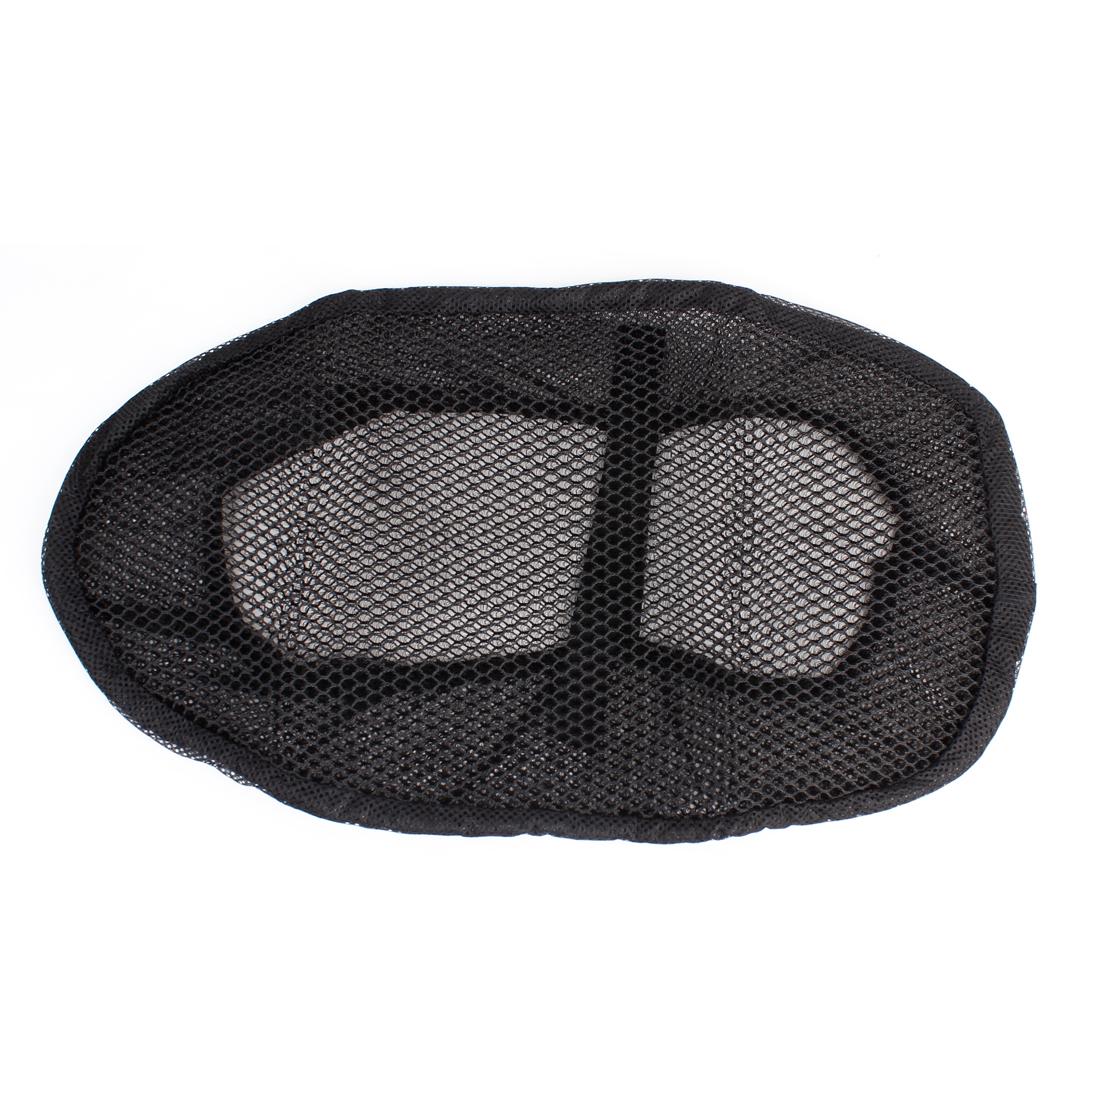 Black Mesh Type Soft Tertolon Seat Cushion Size D for Ladies Electric Bike